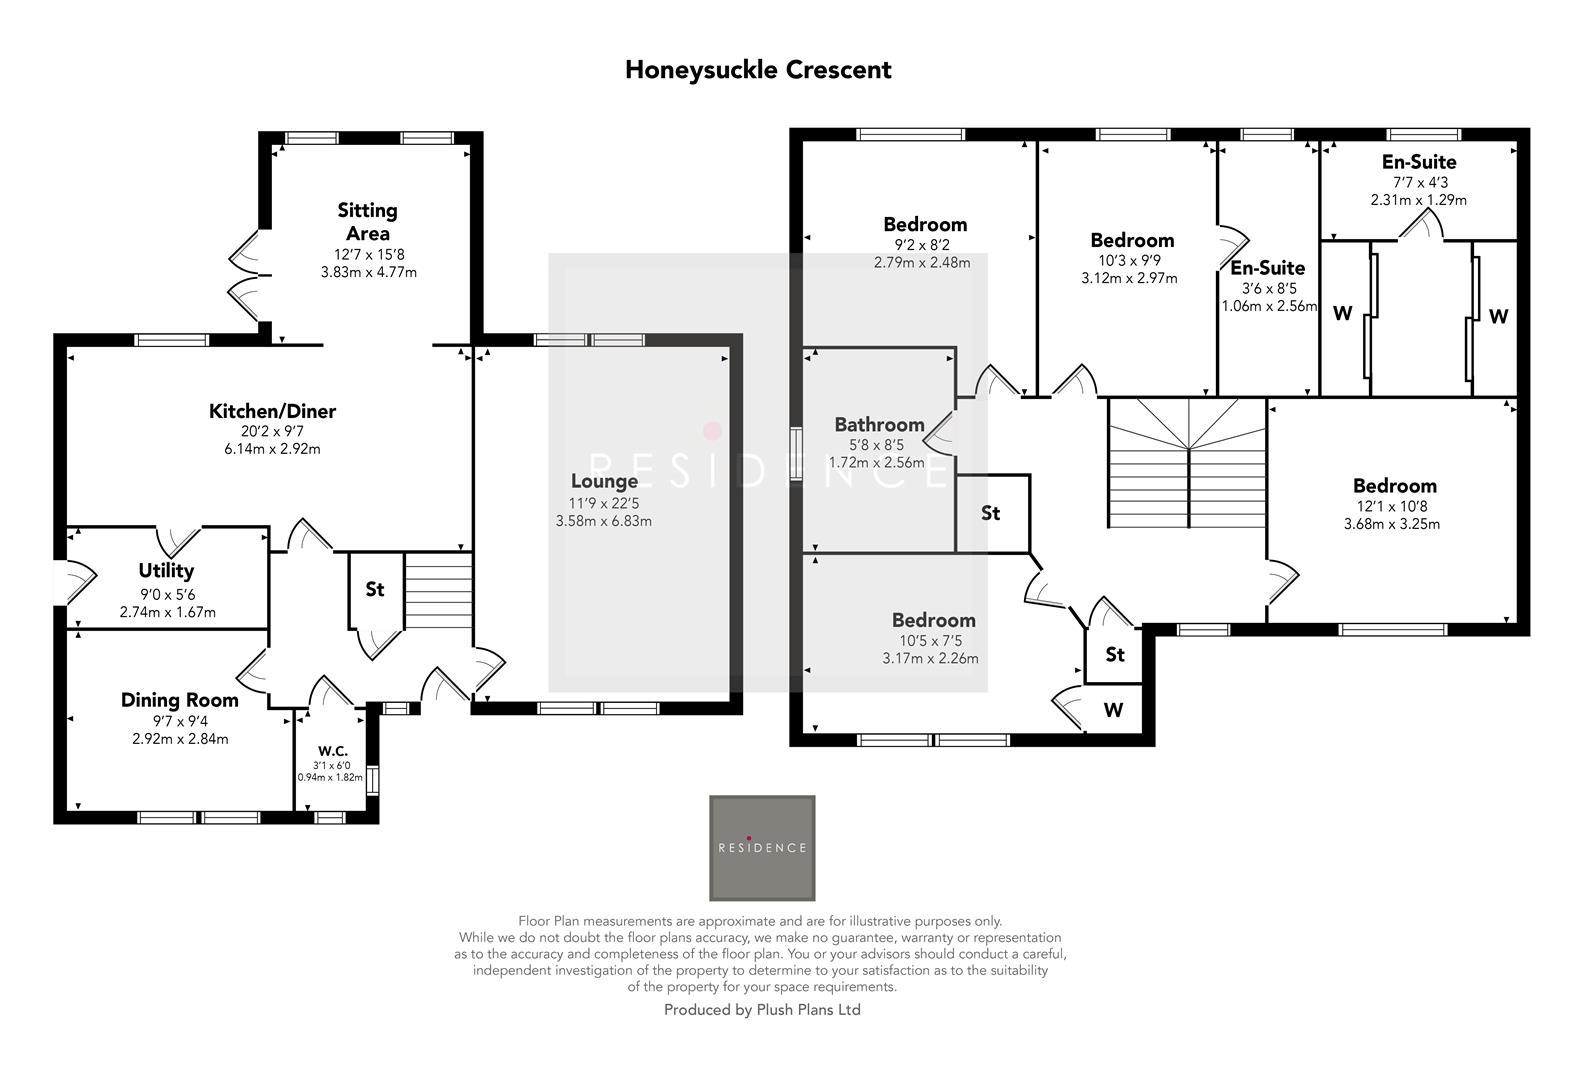 22 Honeysuckle Crescent_fp[1].jpg